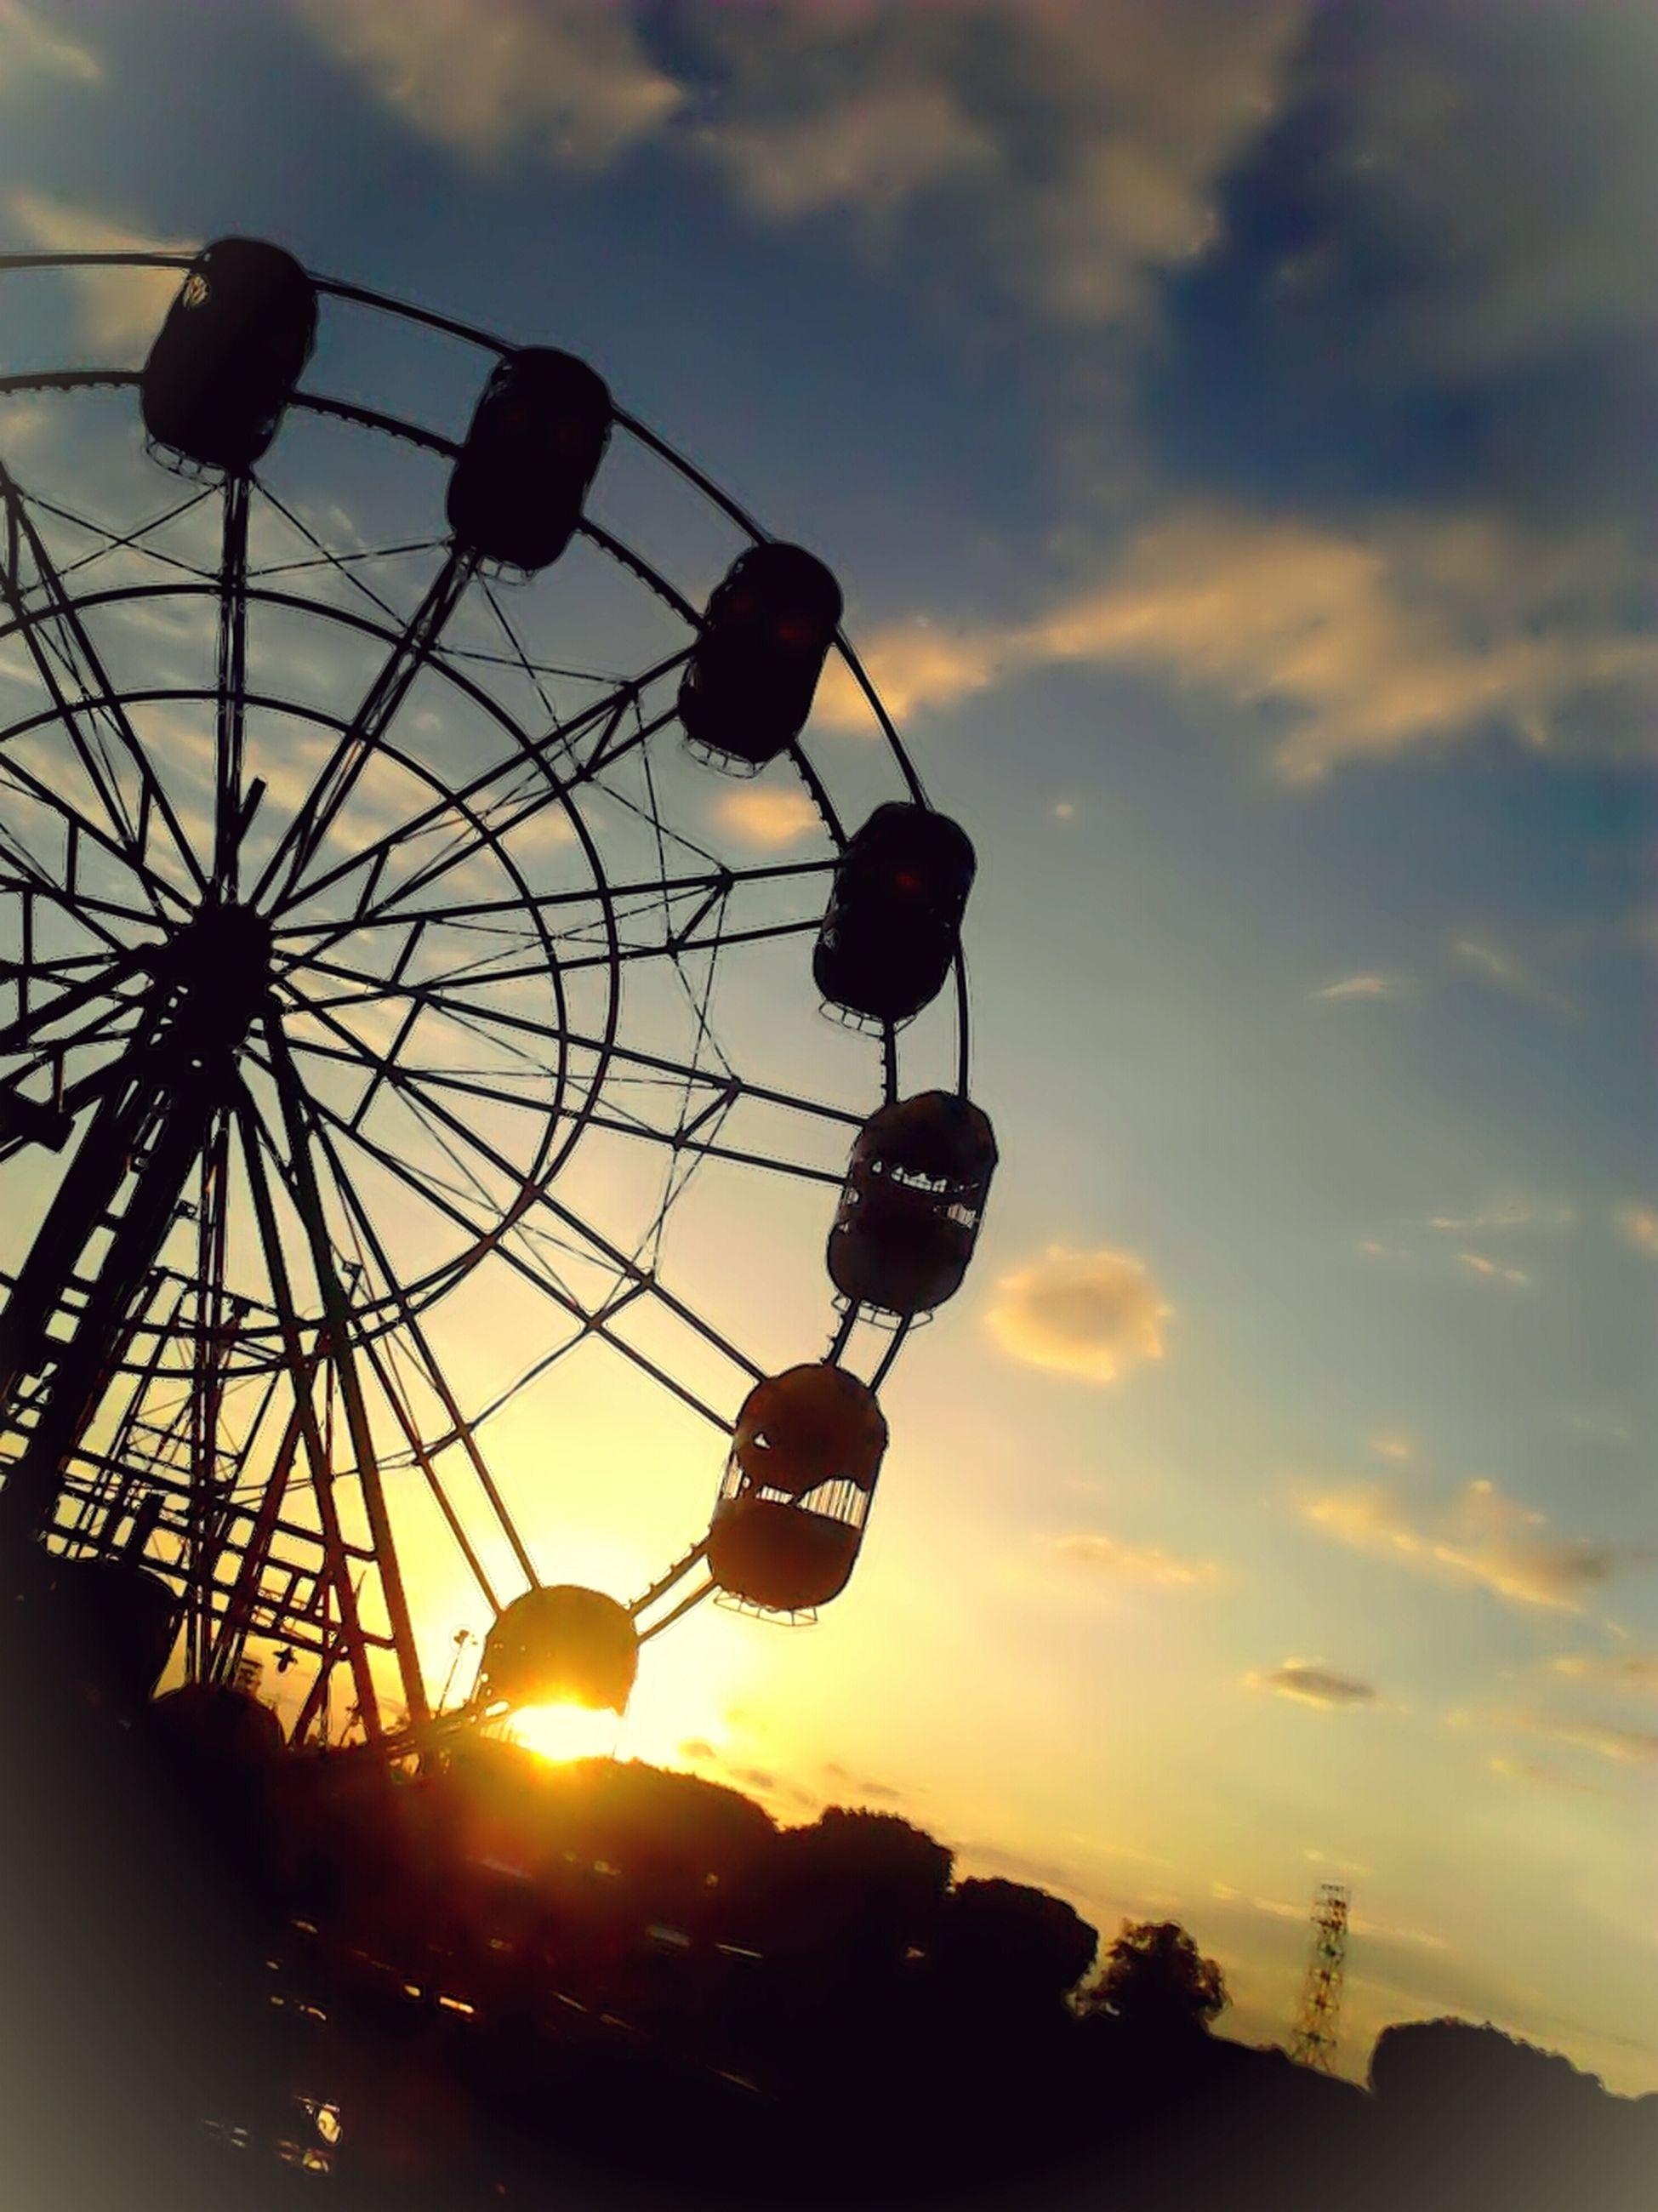 low angle view, sky, sunset, silhouette, sun, cloud - sky, ferris wheel, amusement park, amusement park ride, orange color, cloud, lighting equipment, street light, nature, outdoors, arts culture and entertainment, lens flare, cloudy, beauty in nature, no people